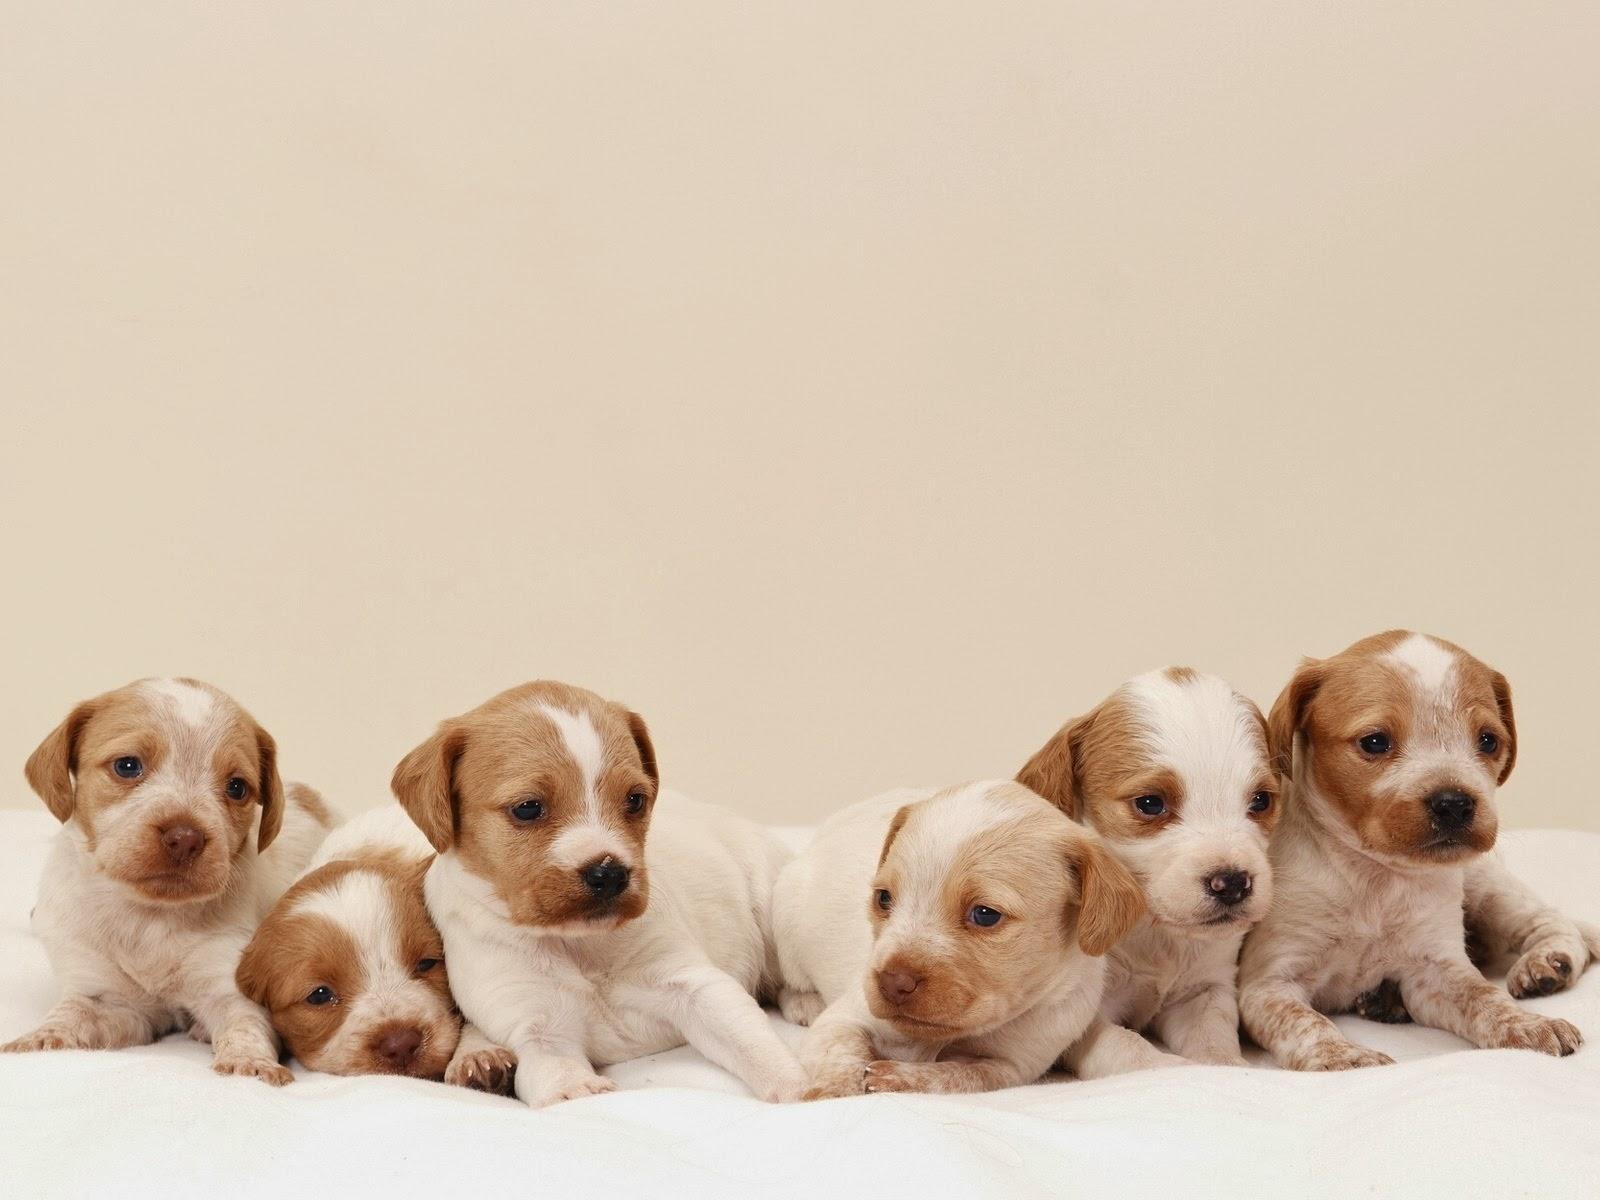 fotos de perritos - photo #6